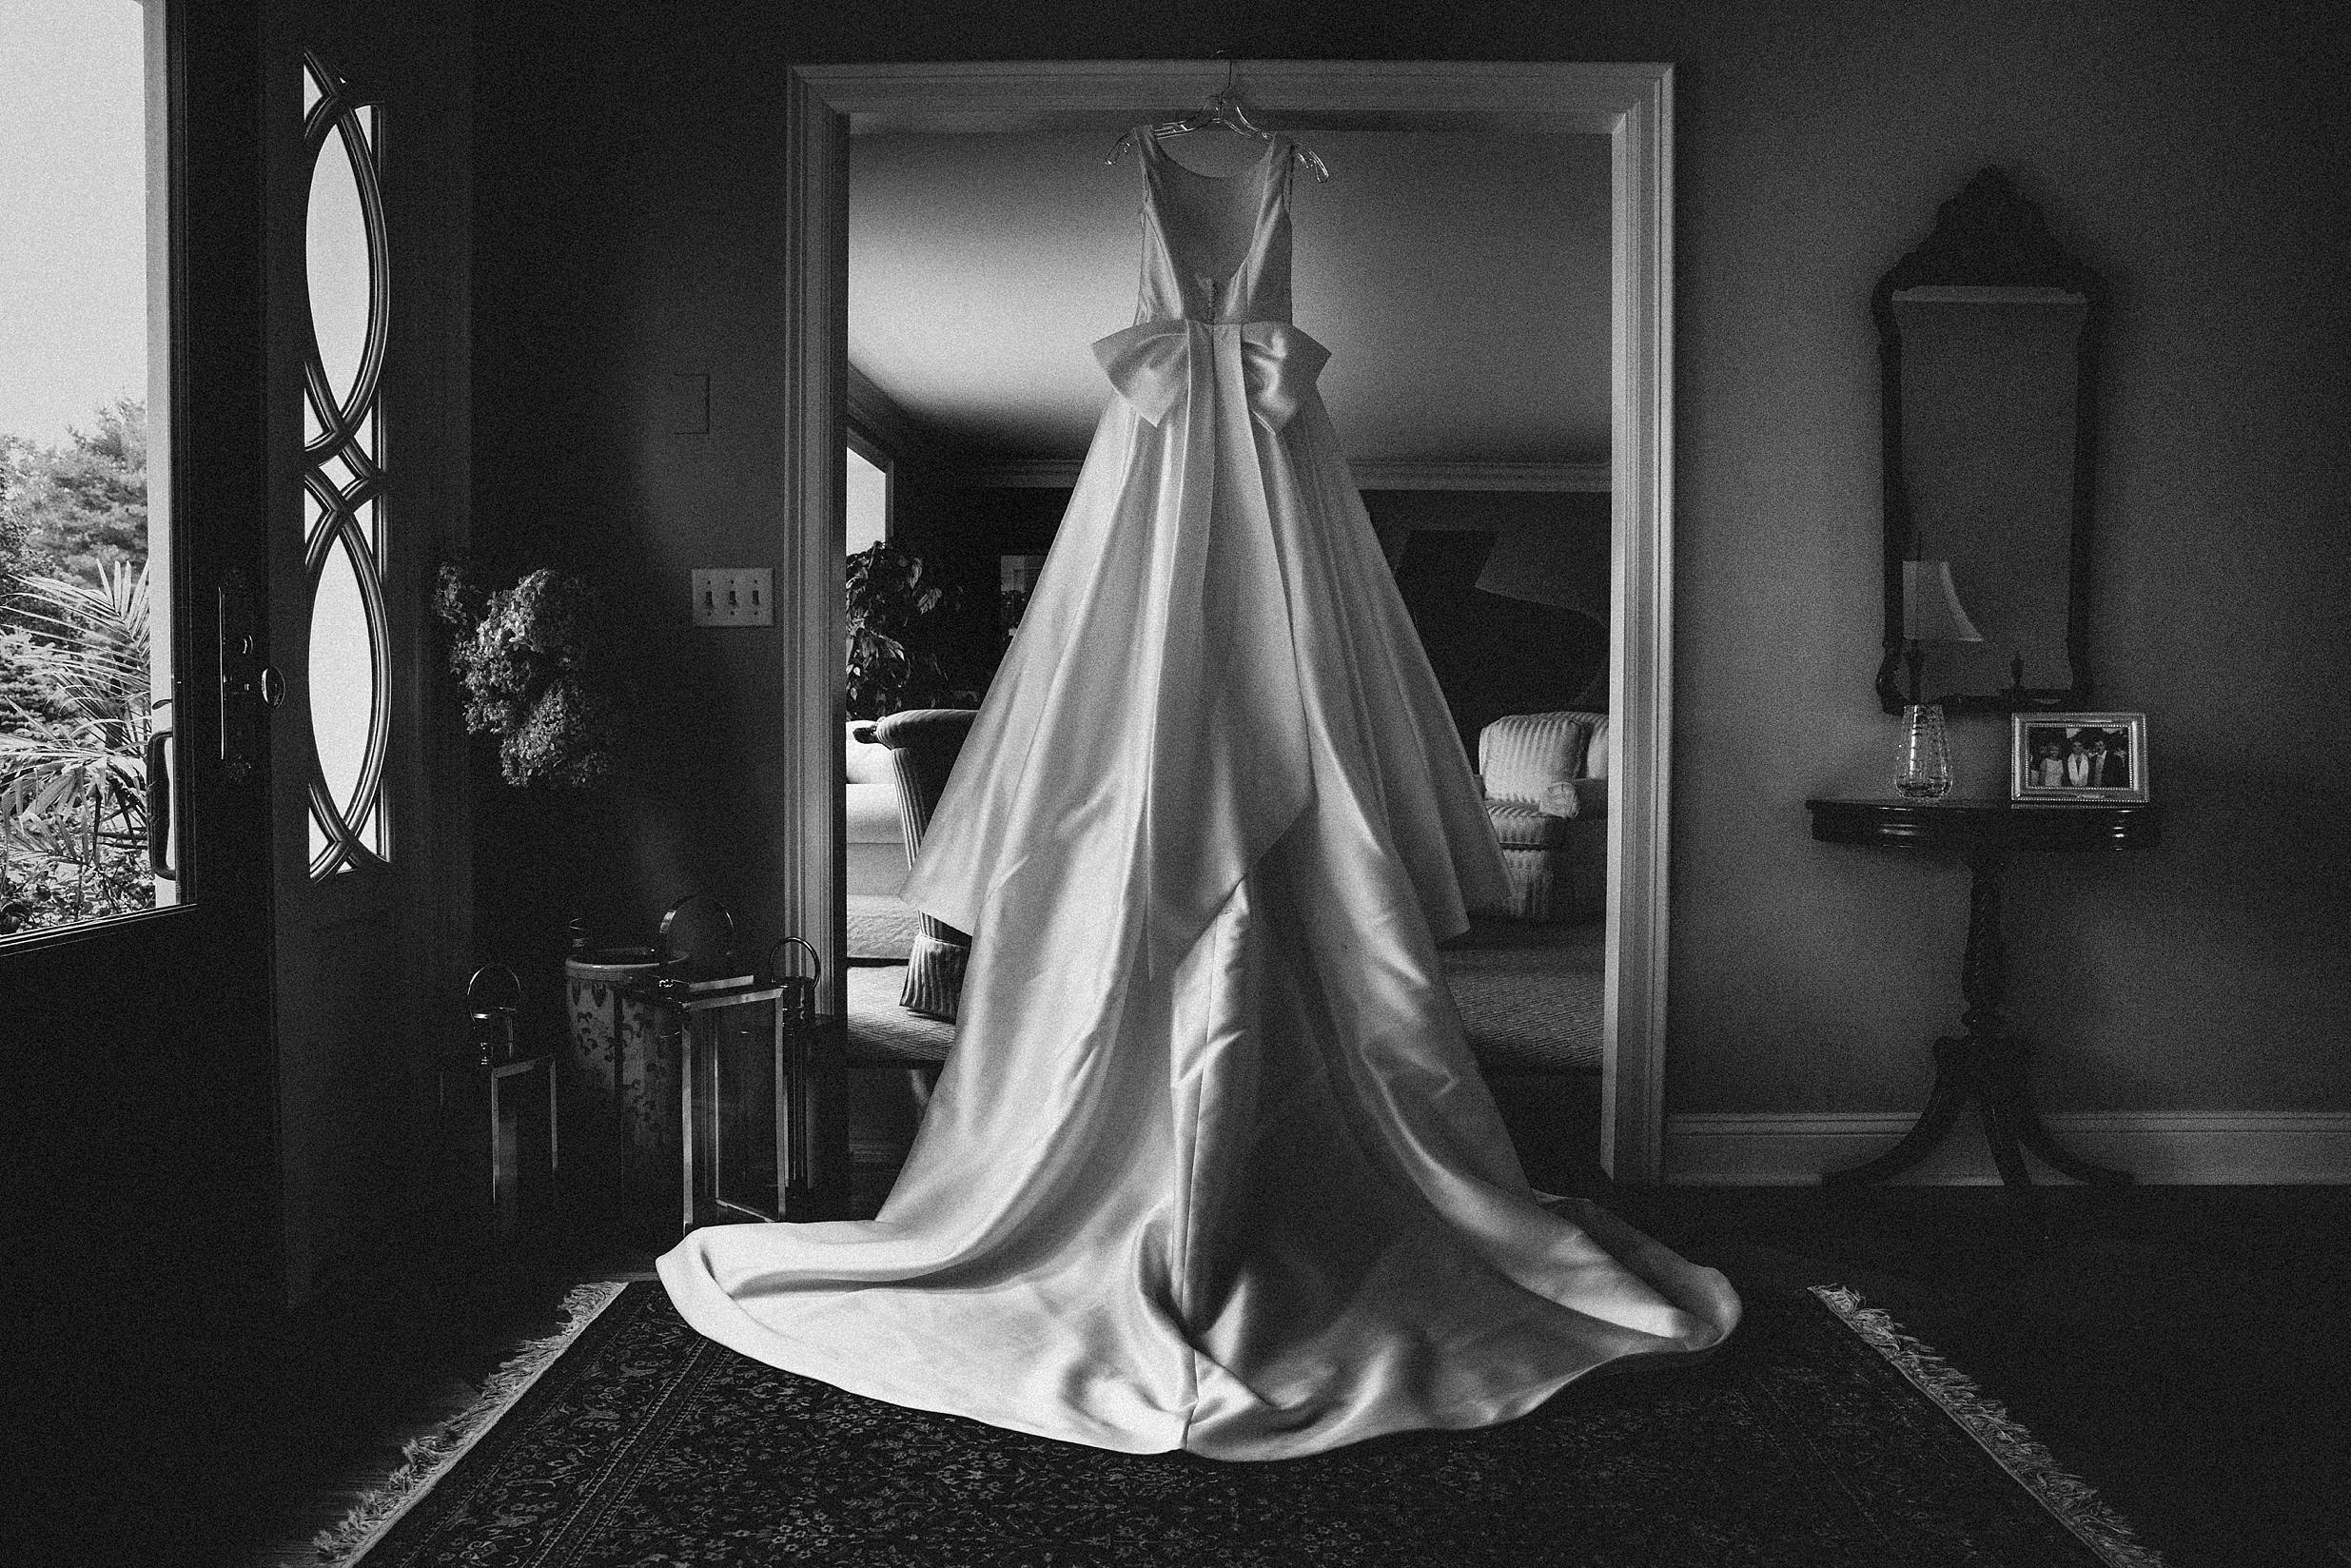 rumson-tented-wedding-nj-maine-conneticut-classic_0002.jpg